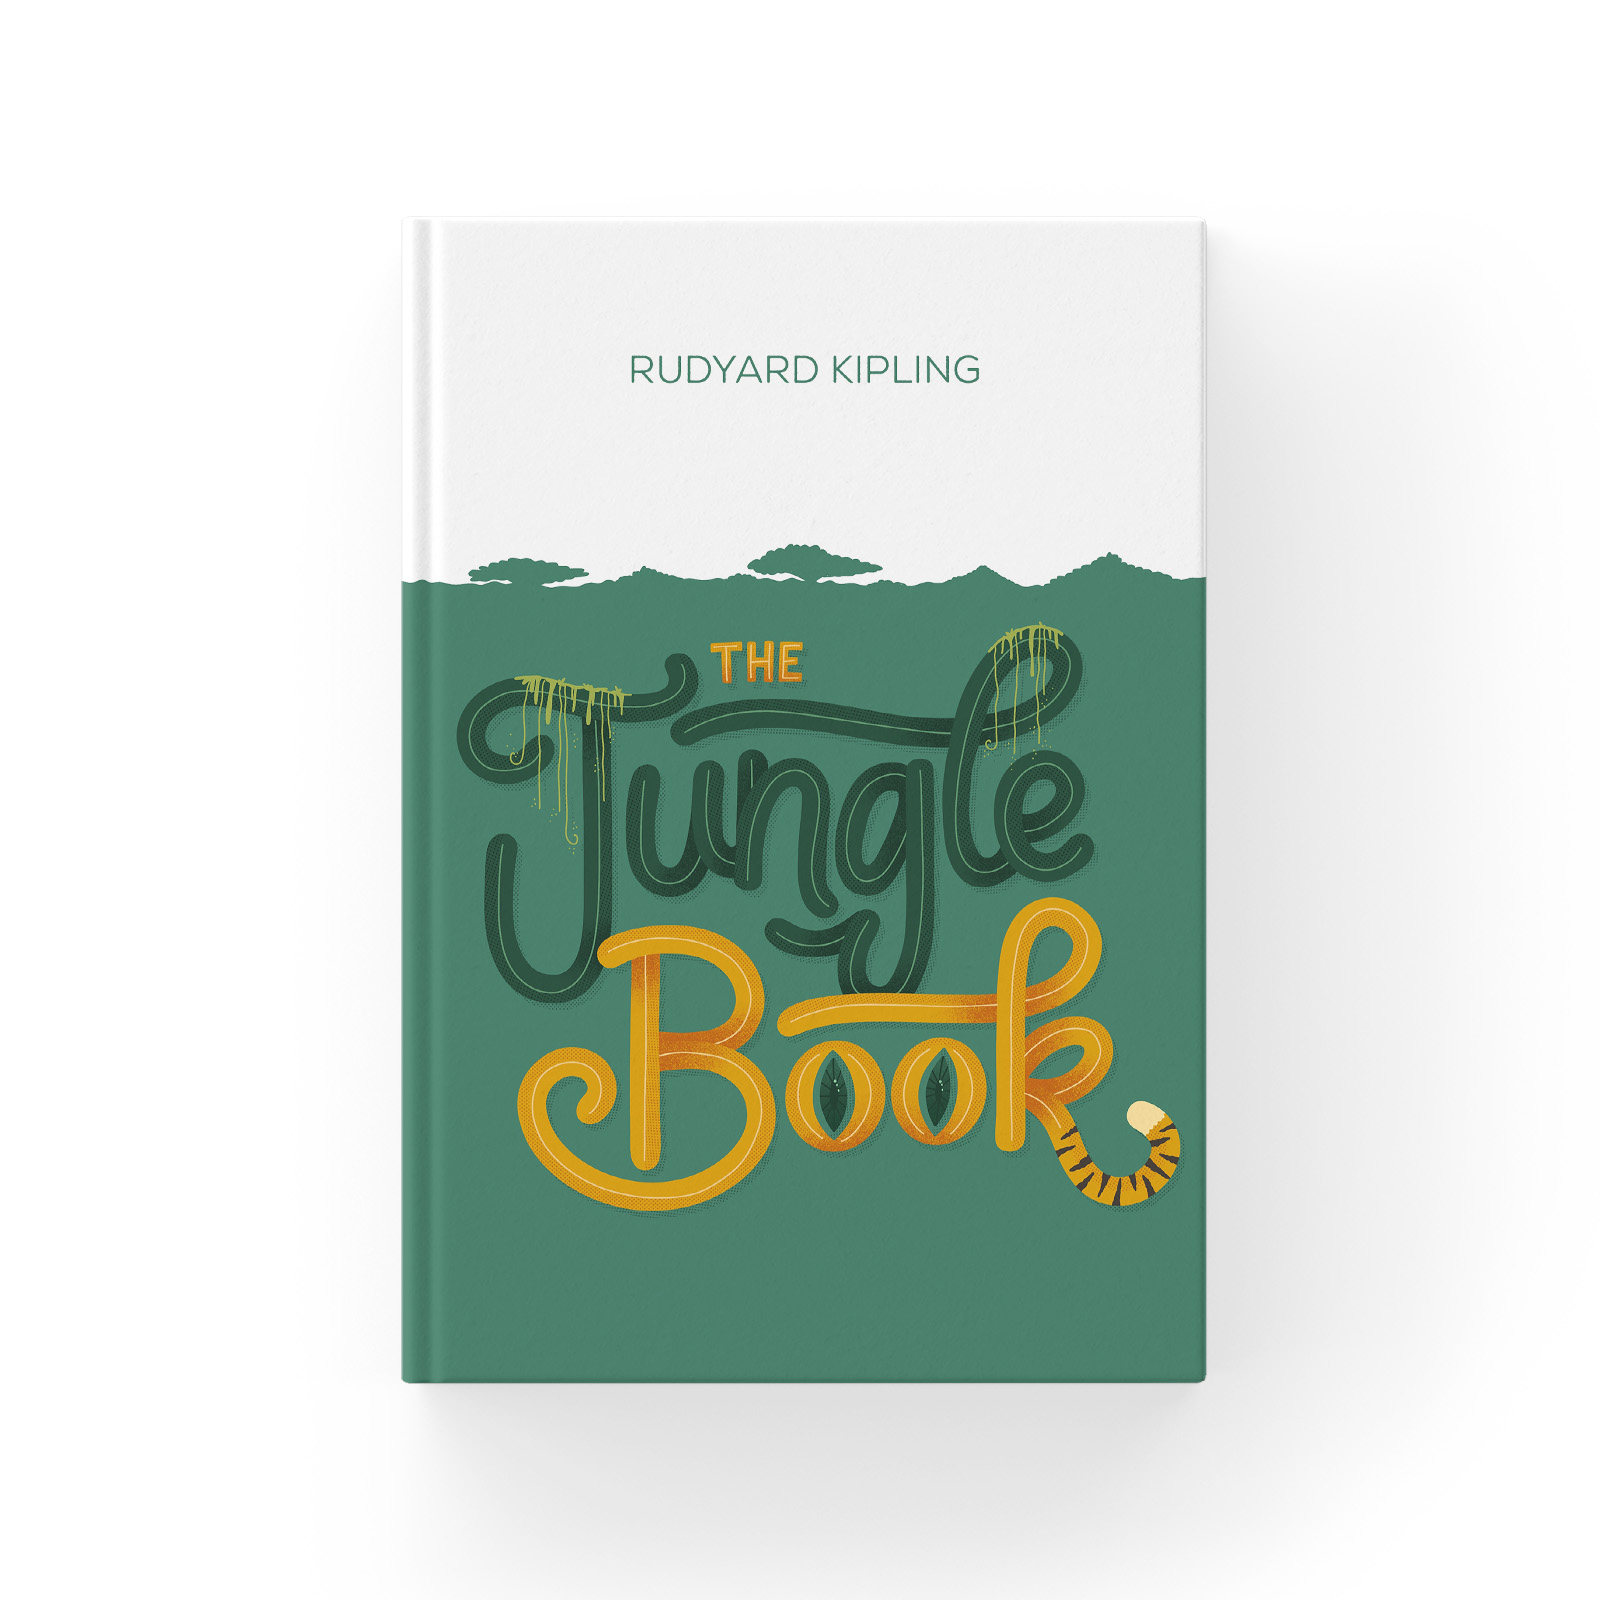 Lettering, Handlettering, Digitales Lettering, Ipad Lettering, Design, Buchcover, Illustration, Buchcover Design, Typografie, Letteringdesign